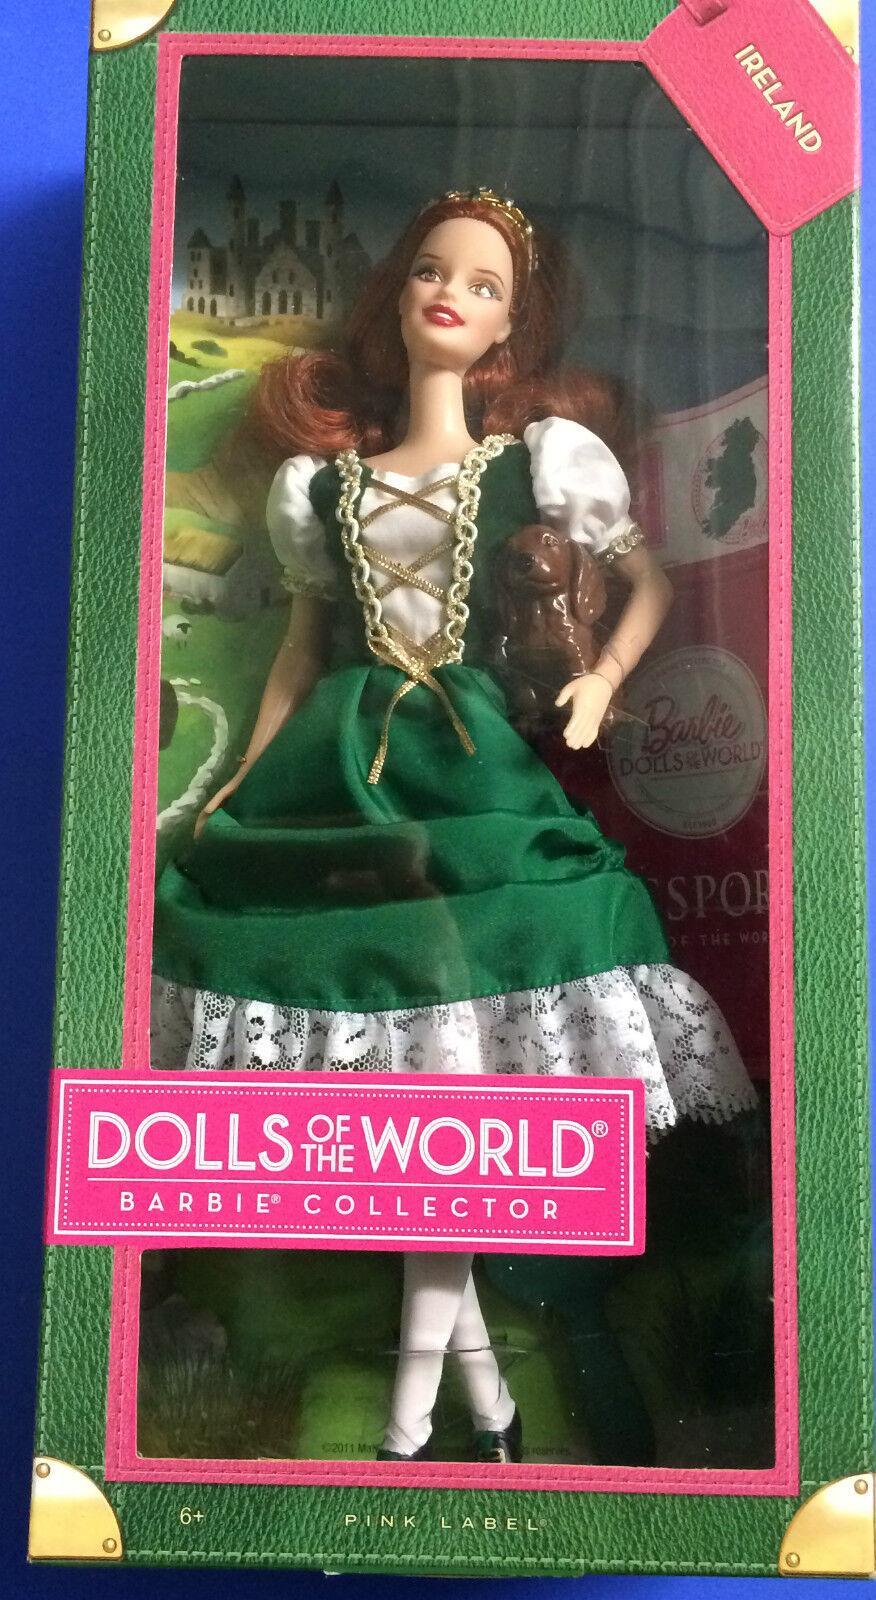 Barbie Sammler Puppe Puppe Puppe 2011 Dolls Of The World Rosa Etikett NRFB   Irland 6d90cc